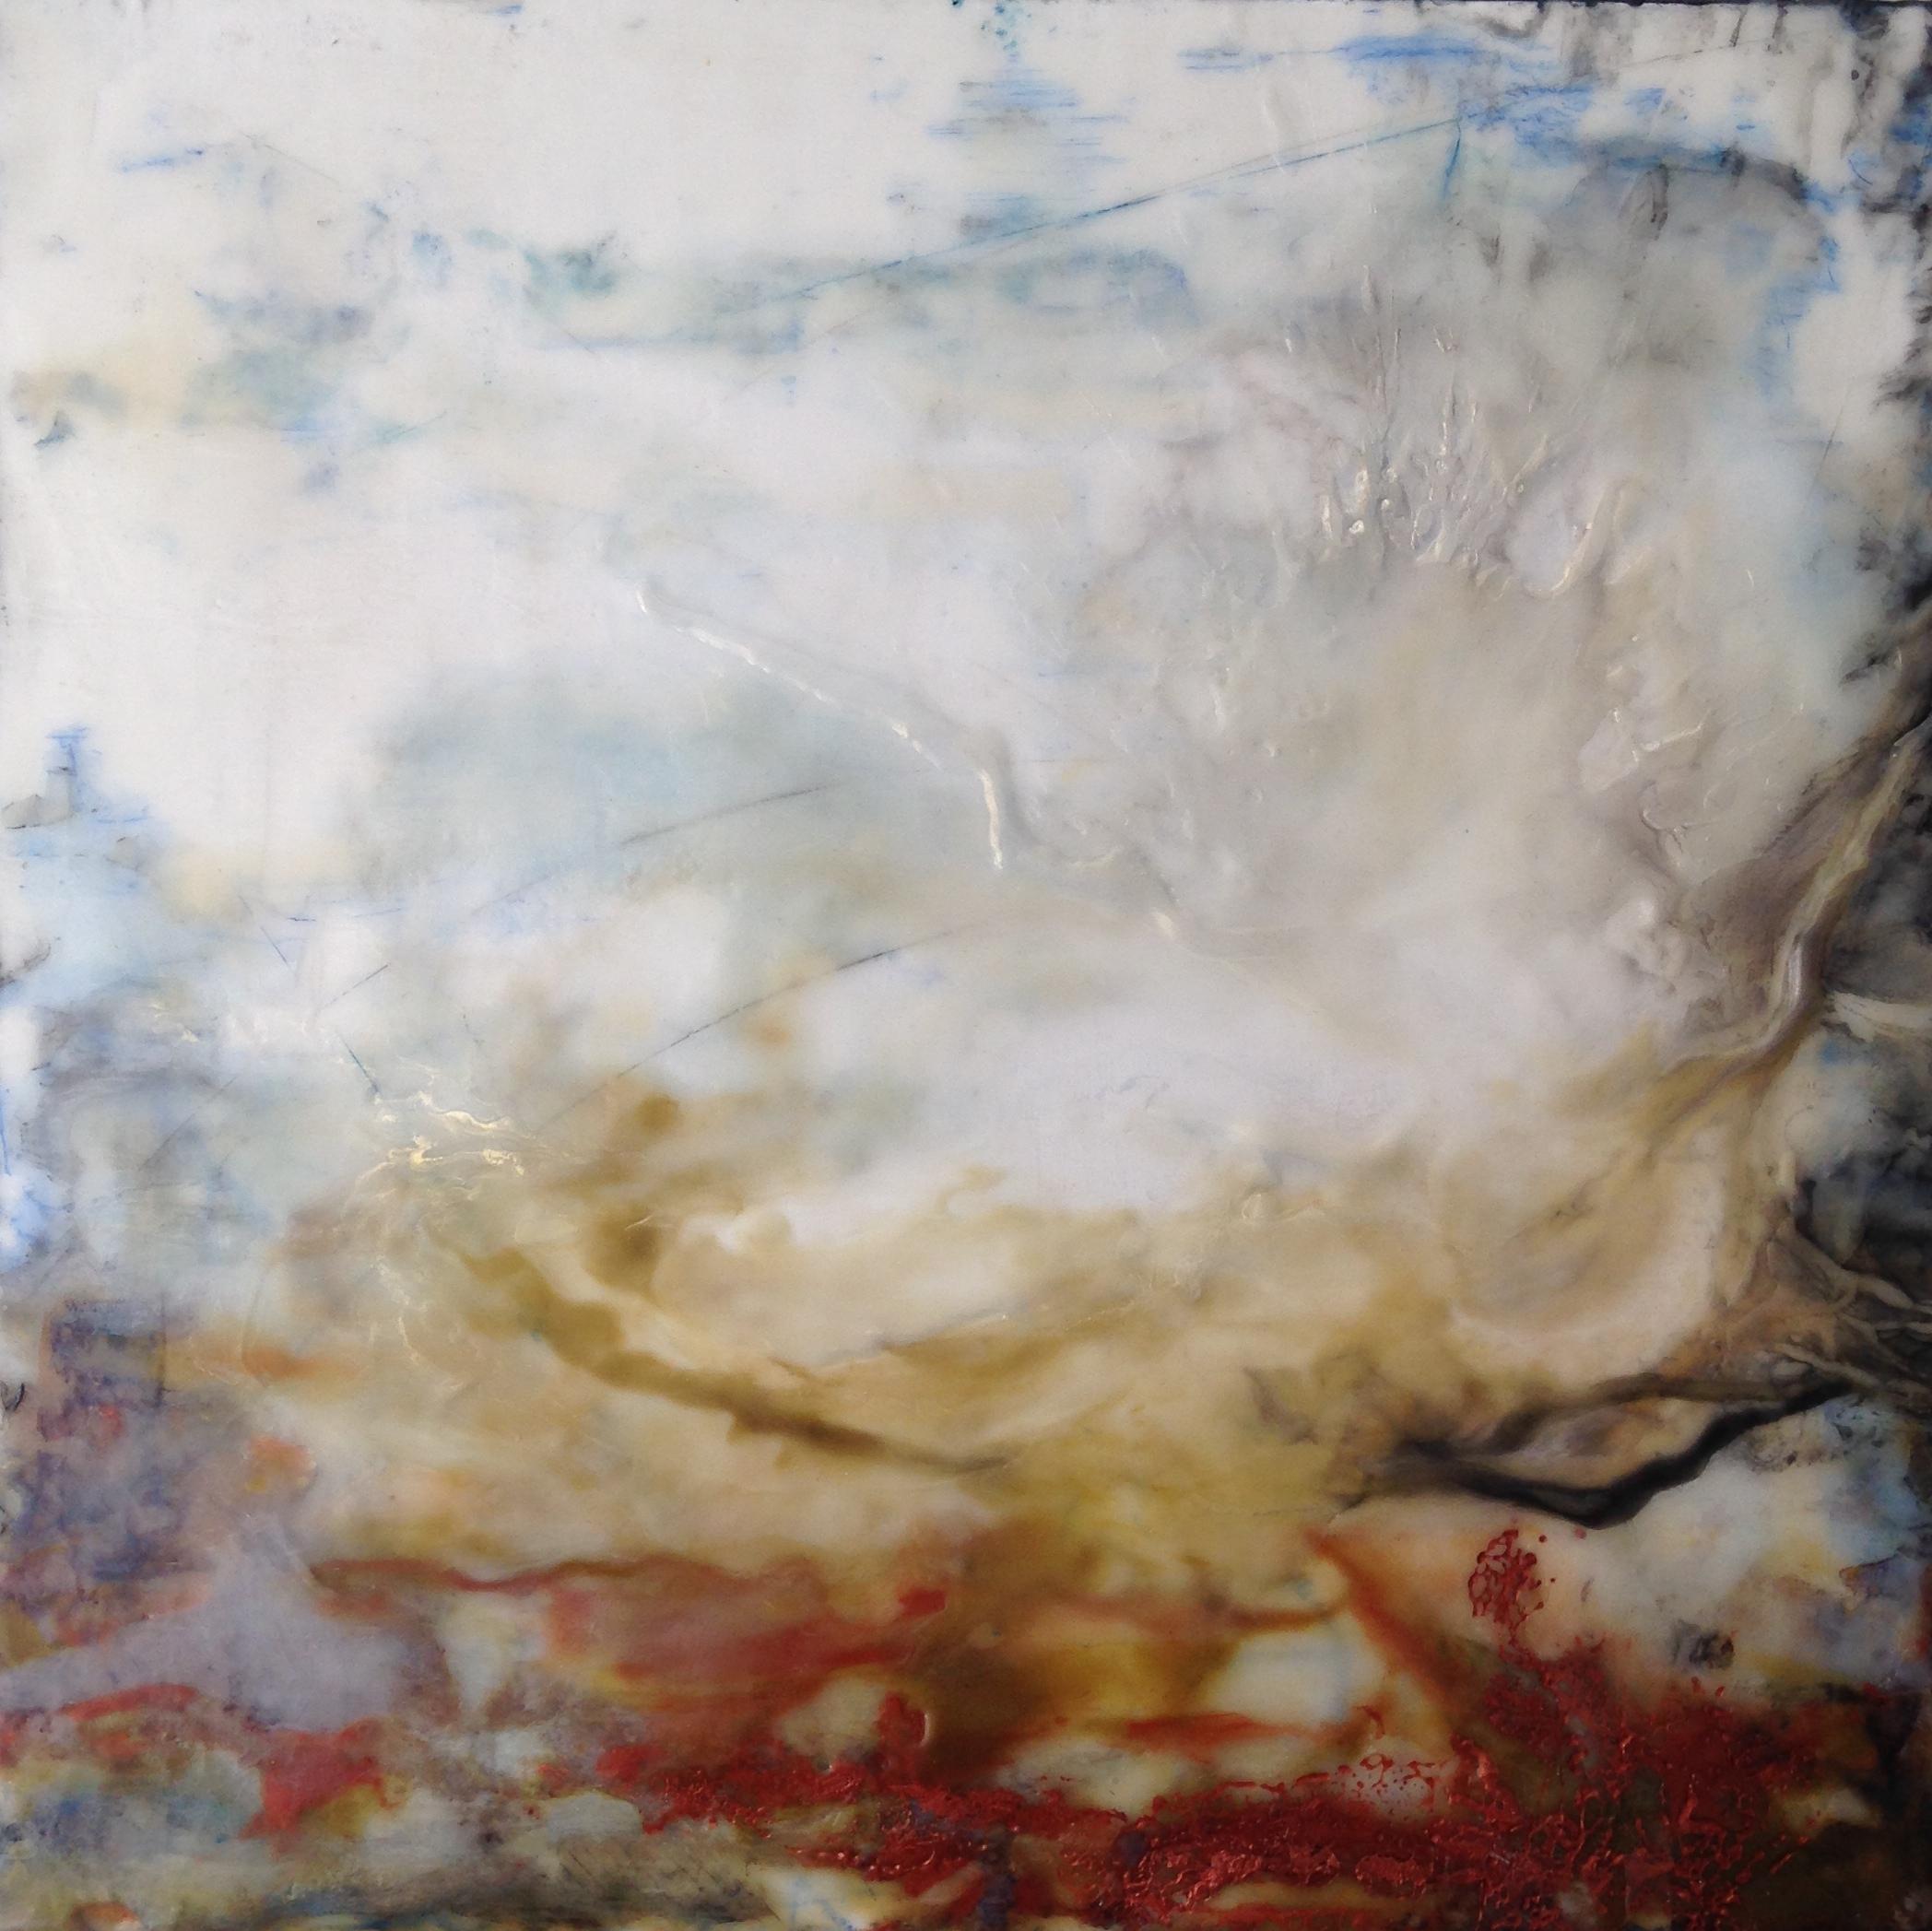 MALAGA,Spain: II Certamen de Pintoras – I am Arte Collective Show – Junta de Andalucia – Ciudad de la Justicia Malaga – NeverSink VII – Encaustic on Wood